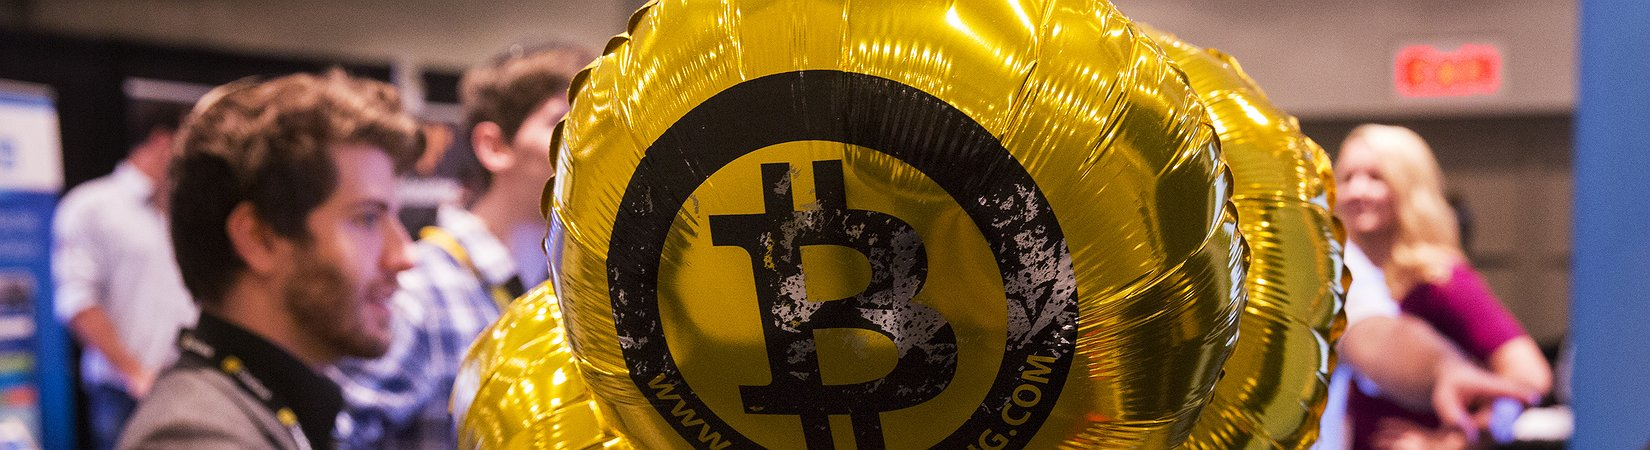 Aproxima-se o momento da verdade para o Winklevoss Bitcoin Trust, ETF de Bitcoin